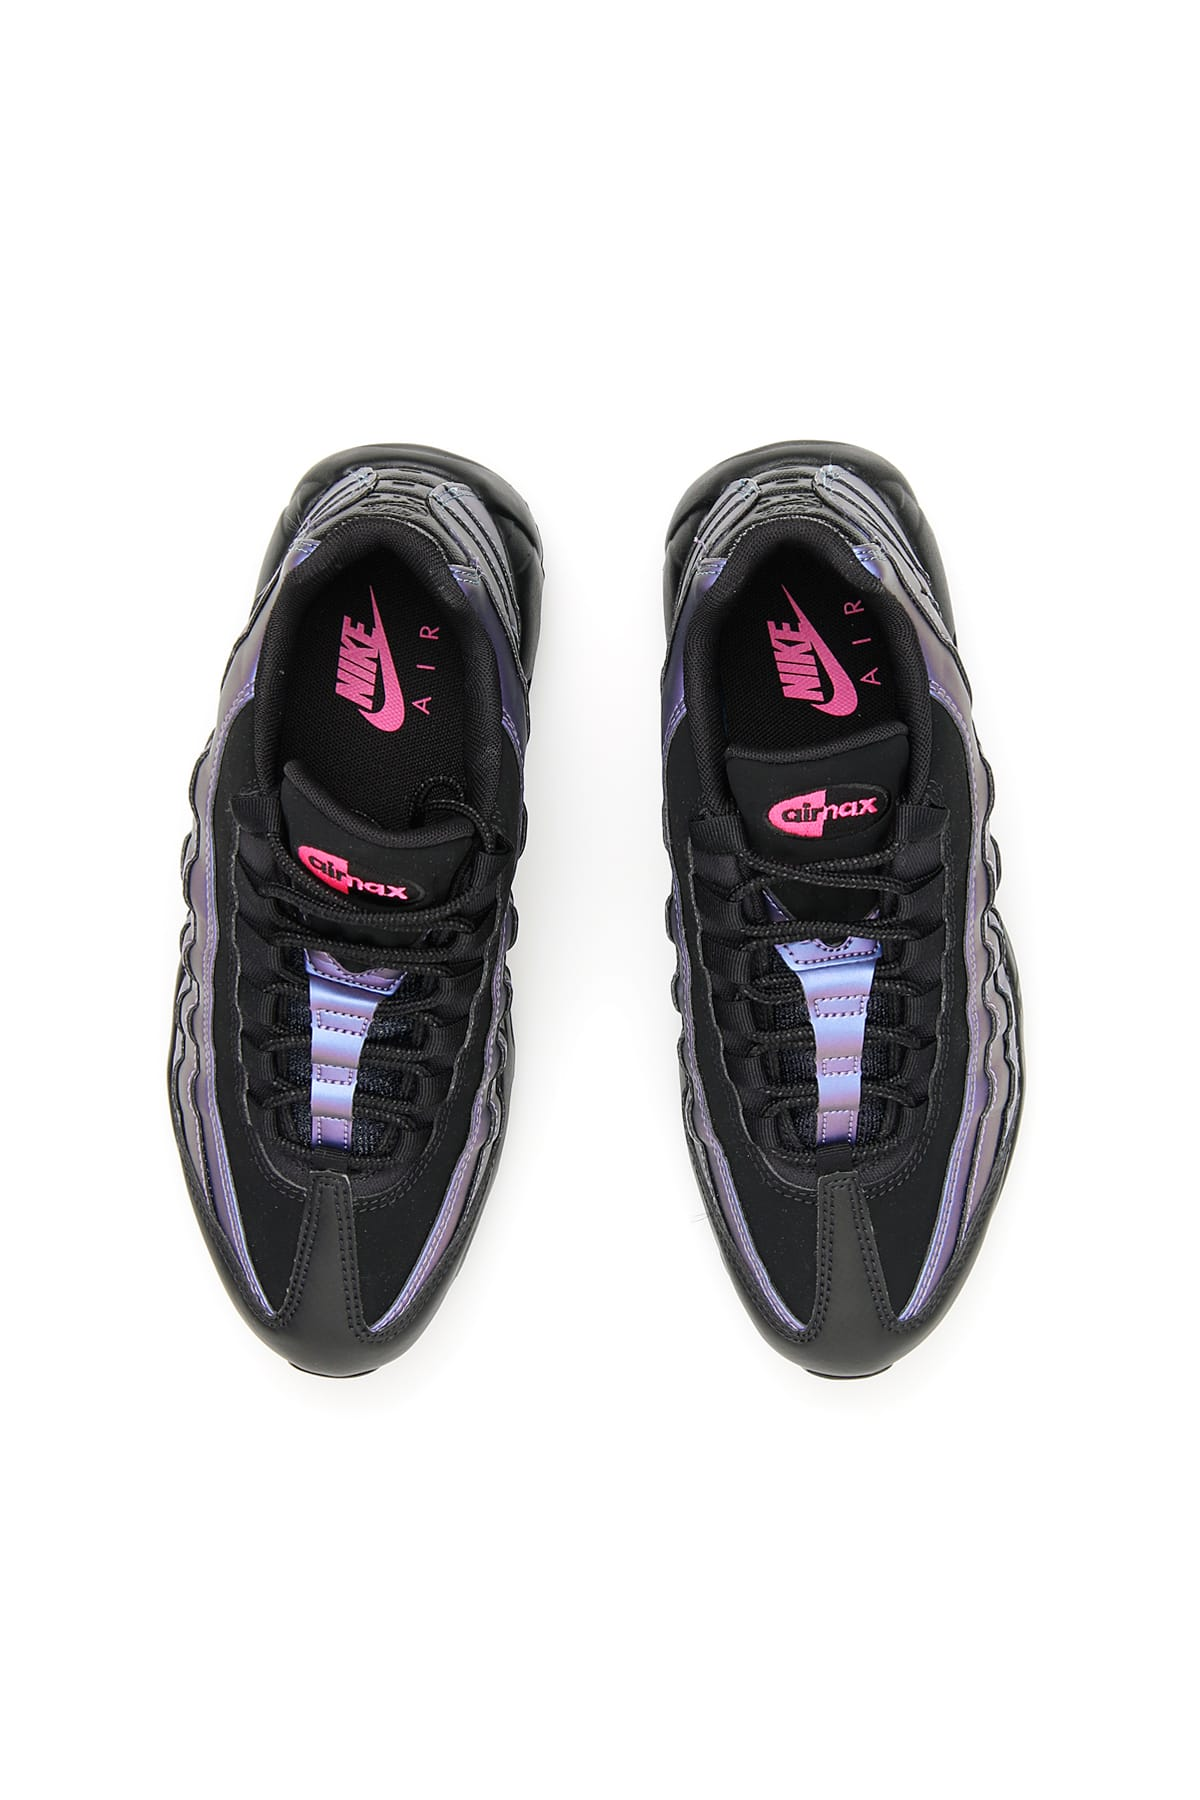 air max 95 black and purple